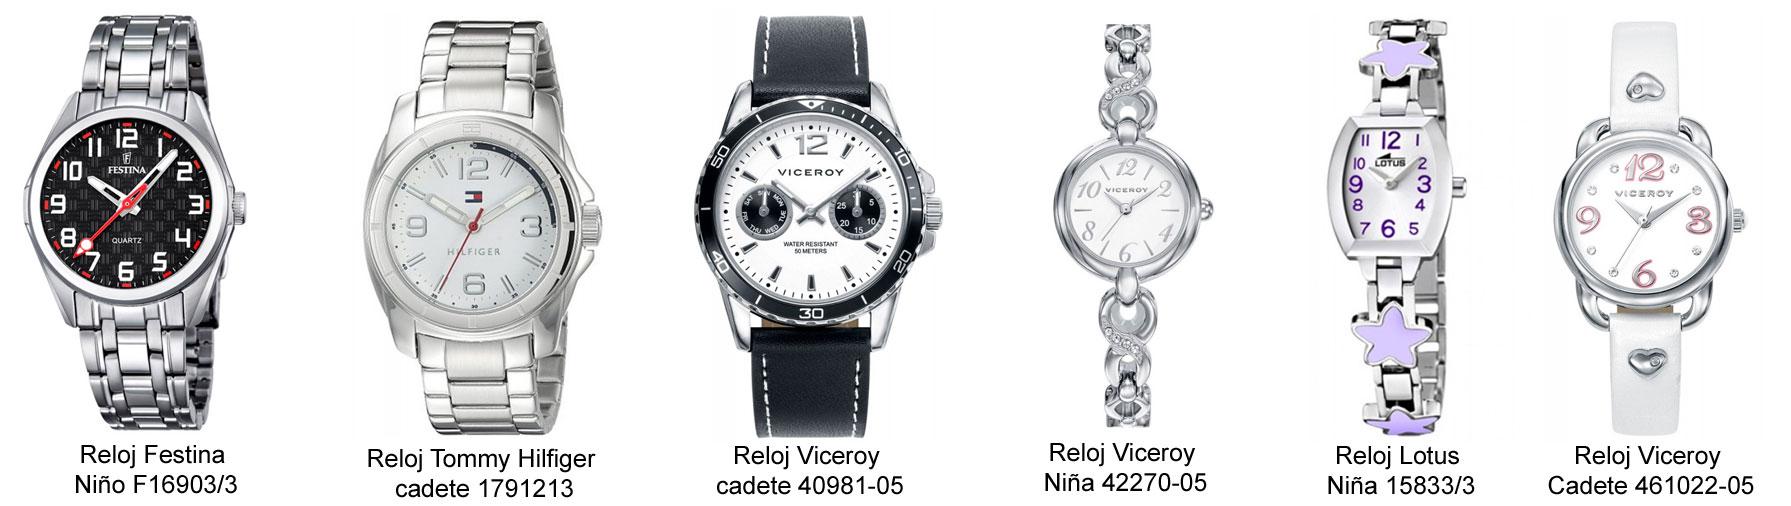 relojes-niños-elegantes d3864dcc00c8